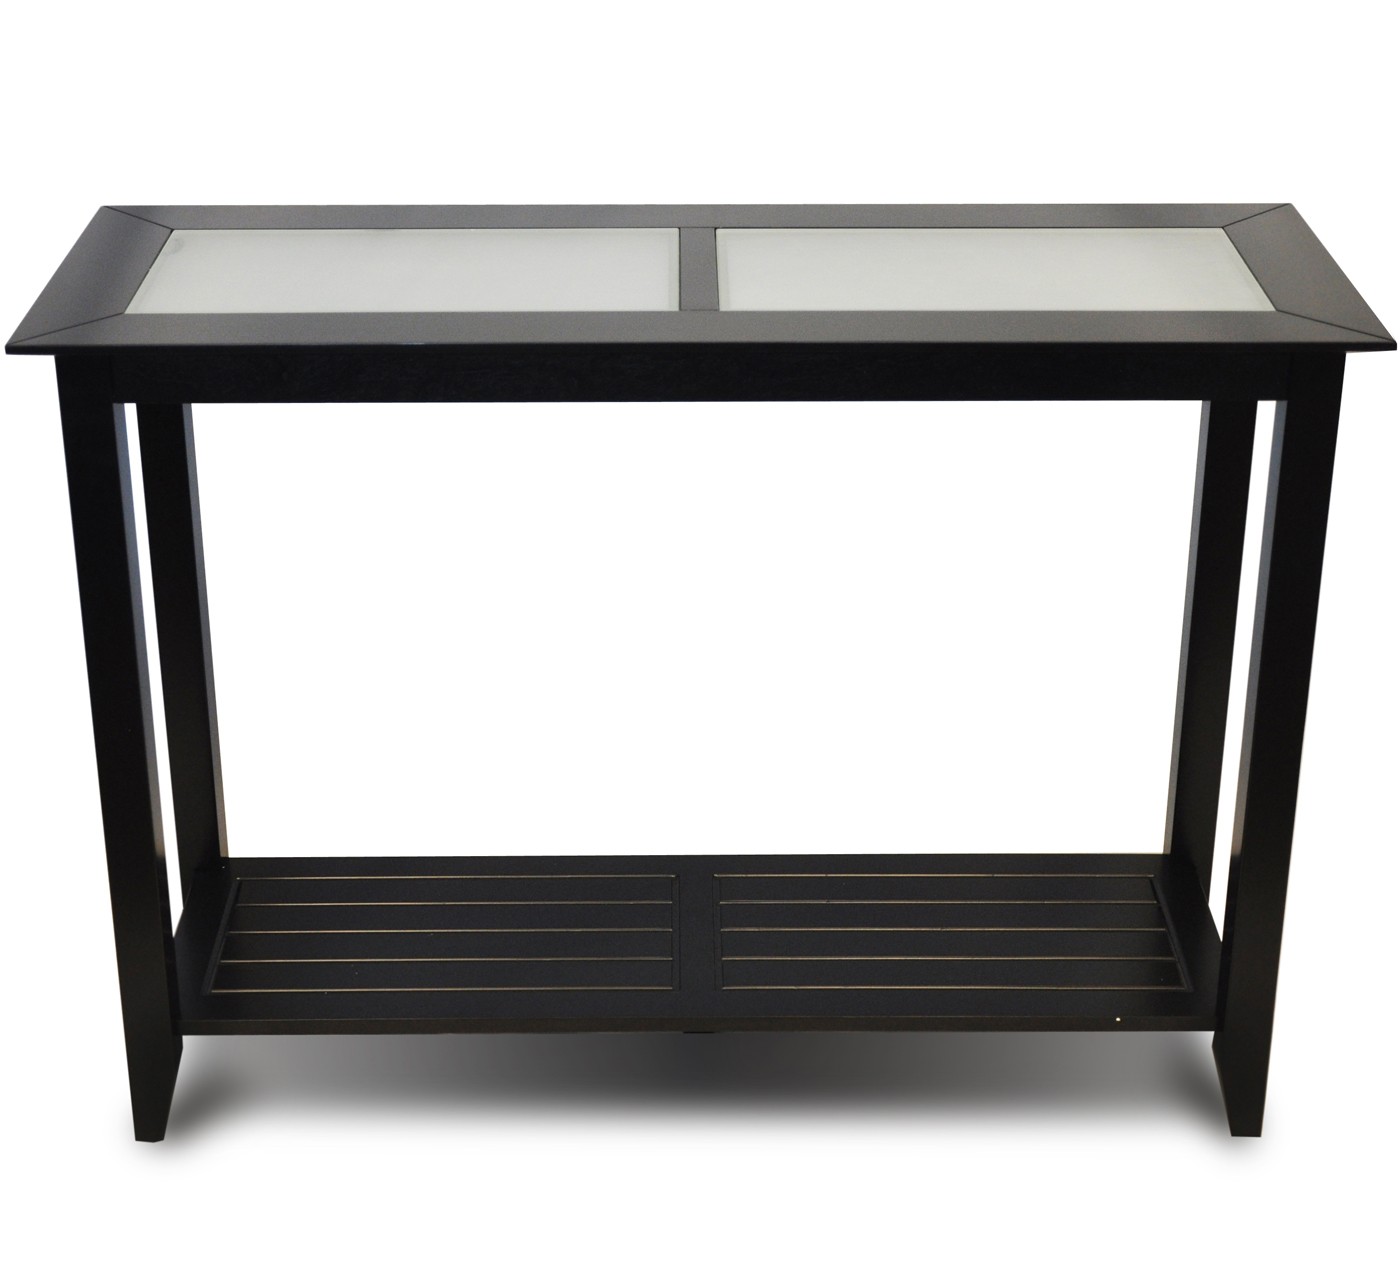 slimline sofa side table teak wood set singapore slim accent console black in